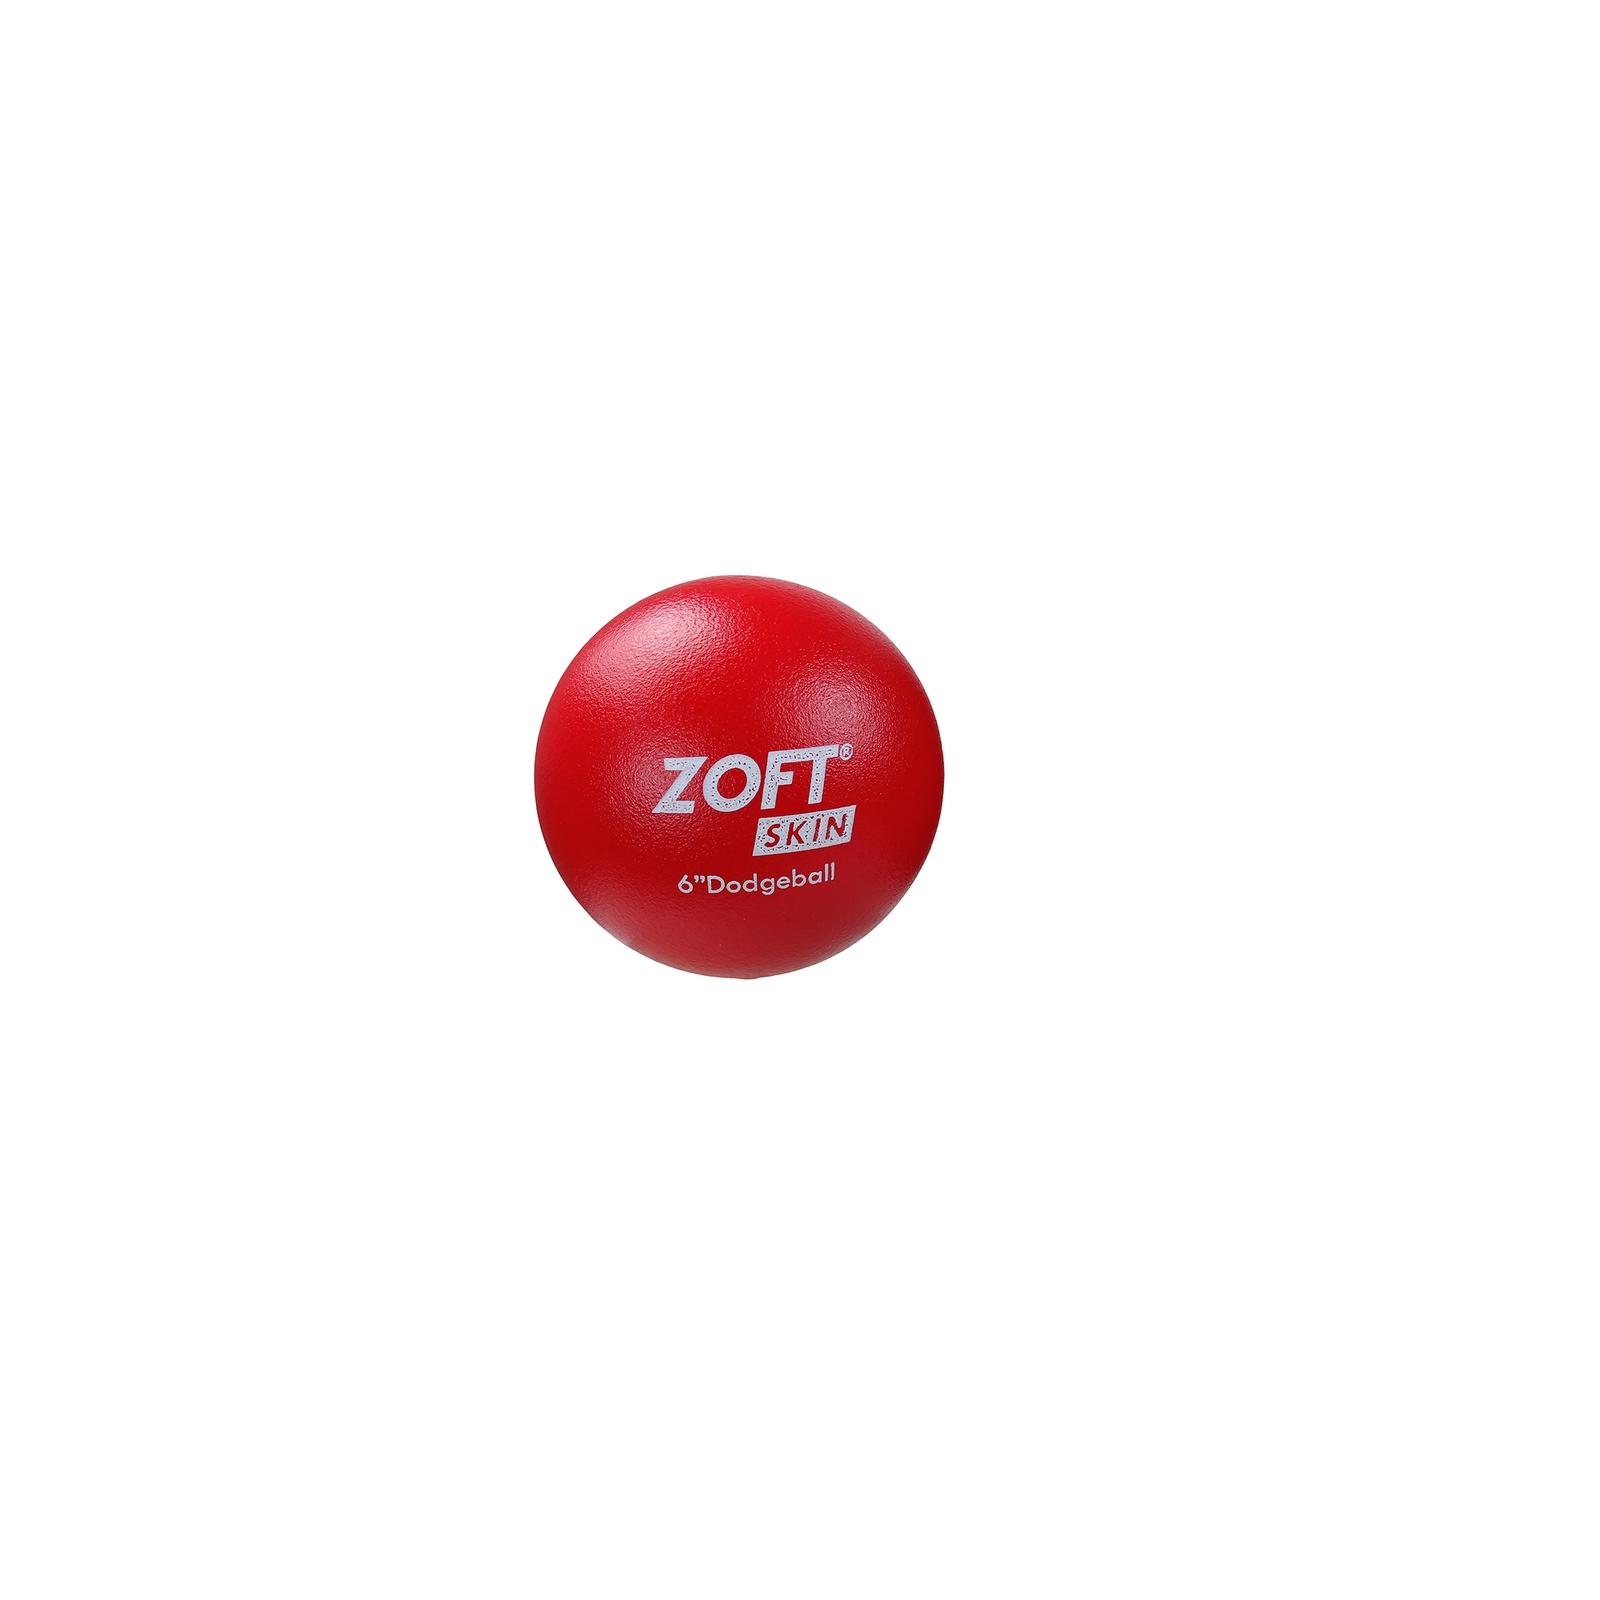 Zoftskin Dodgeball - Size 6 - Red